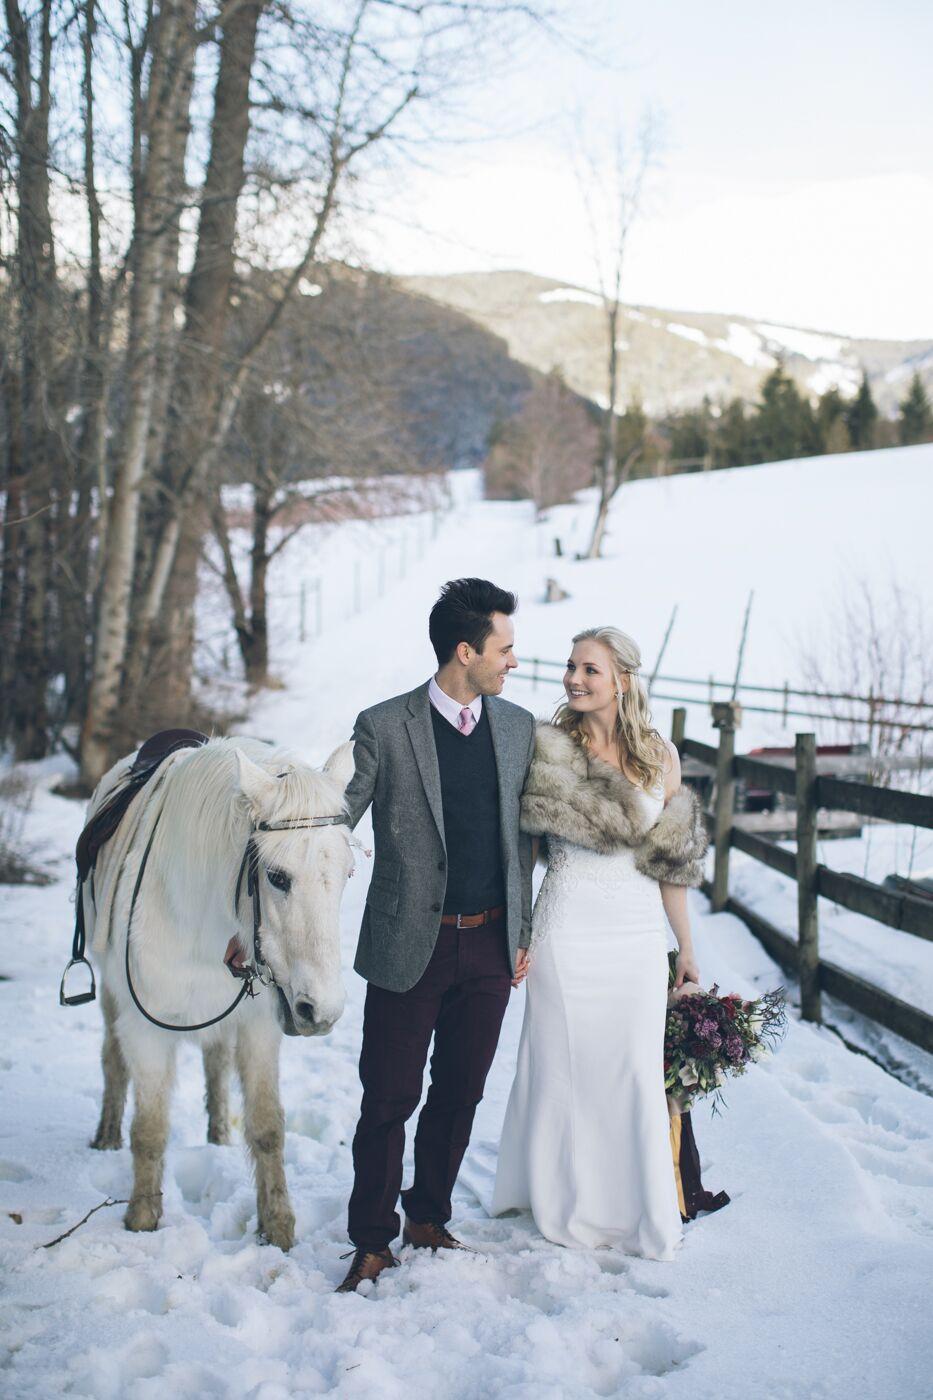 aniko-photography-mt-hood-bnb-wedding-63_preview.jpeg